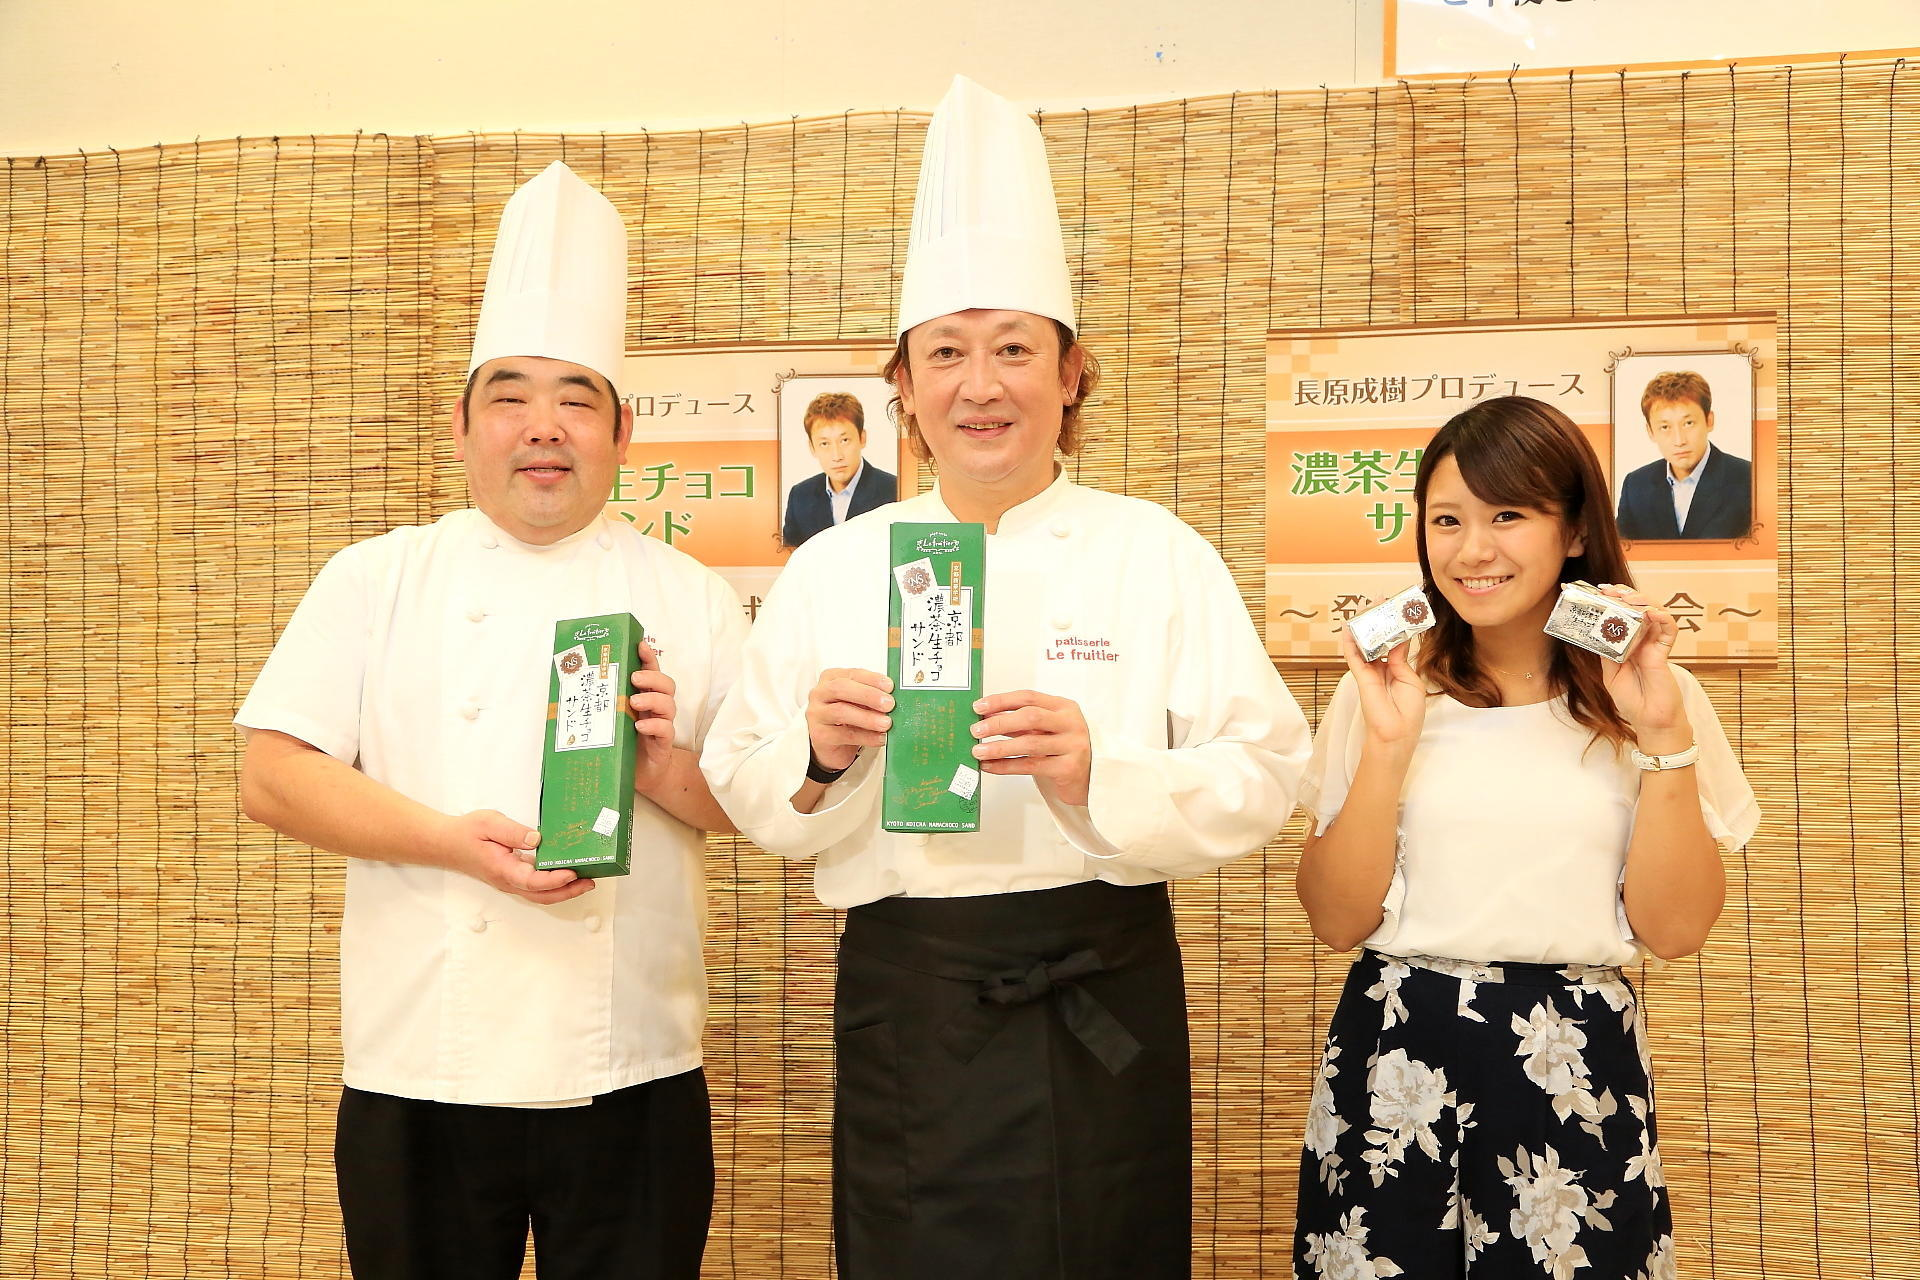 http://news.yoshimoto.co.jp/20170815163432-83fbed489294b144d319ceae210f46f00d59cbd7.jpg